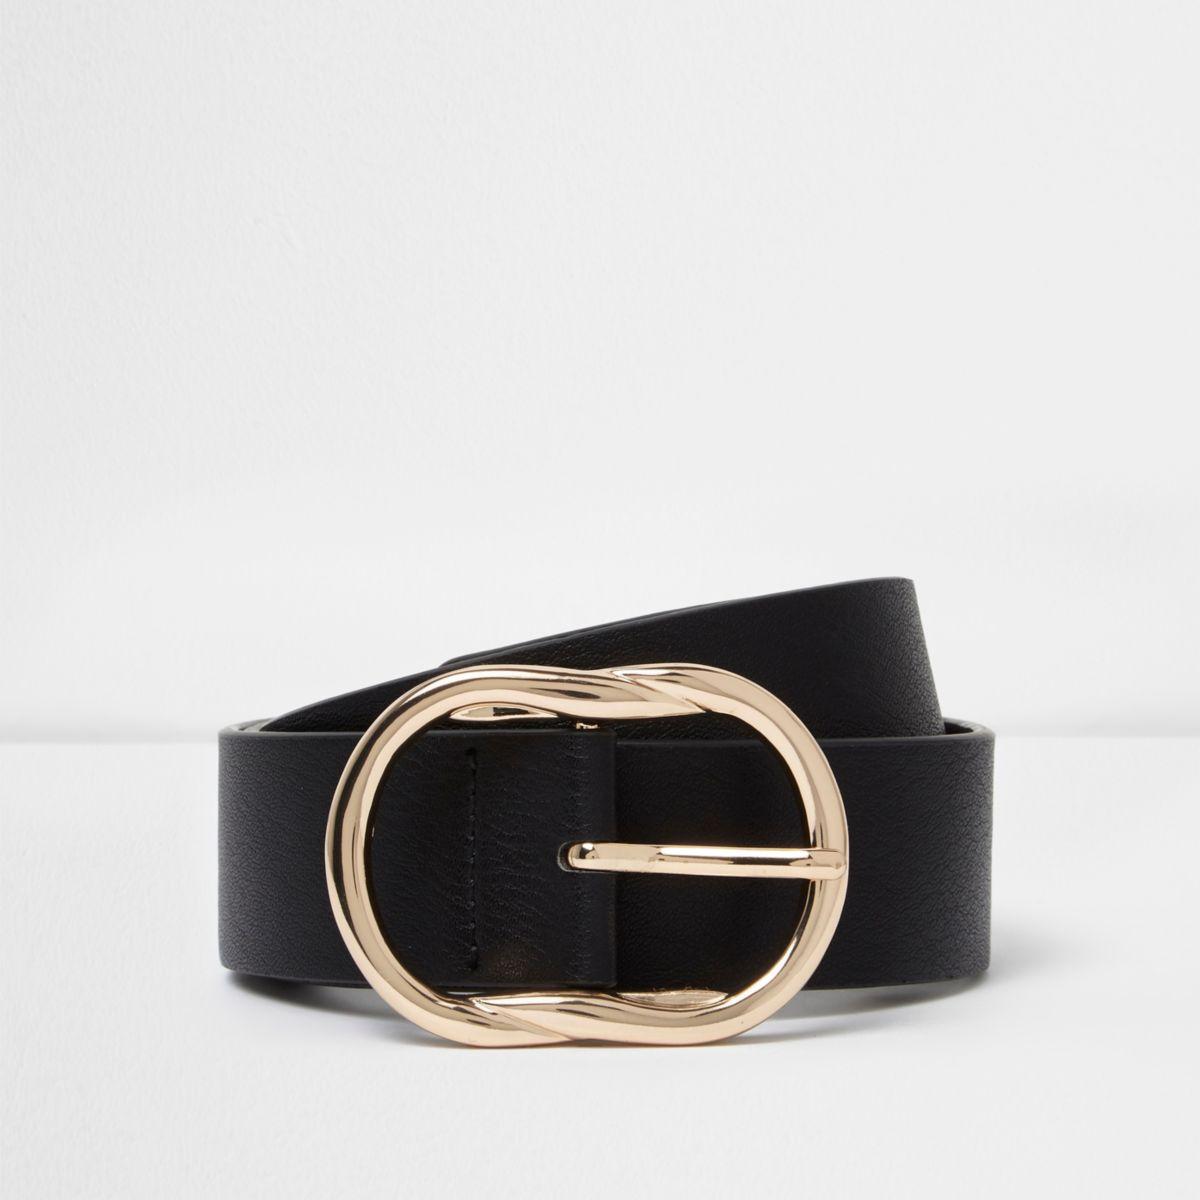 Black oval buckle jeans belt